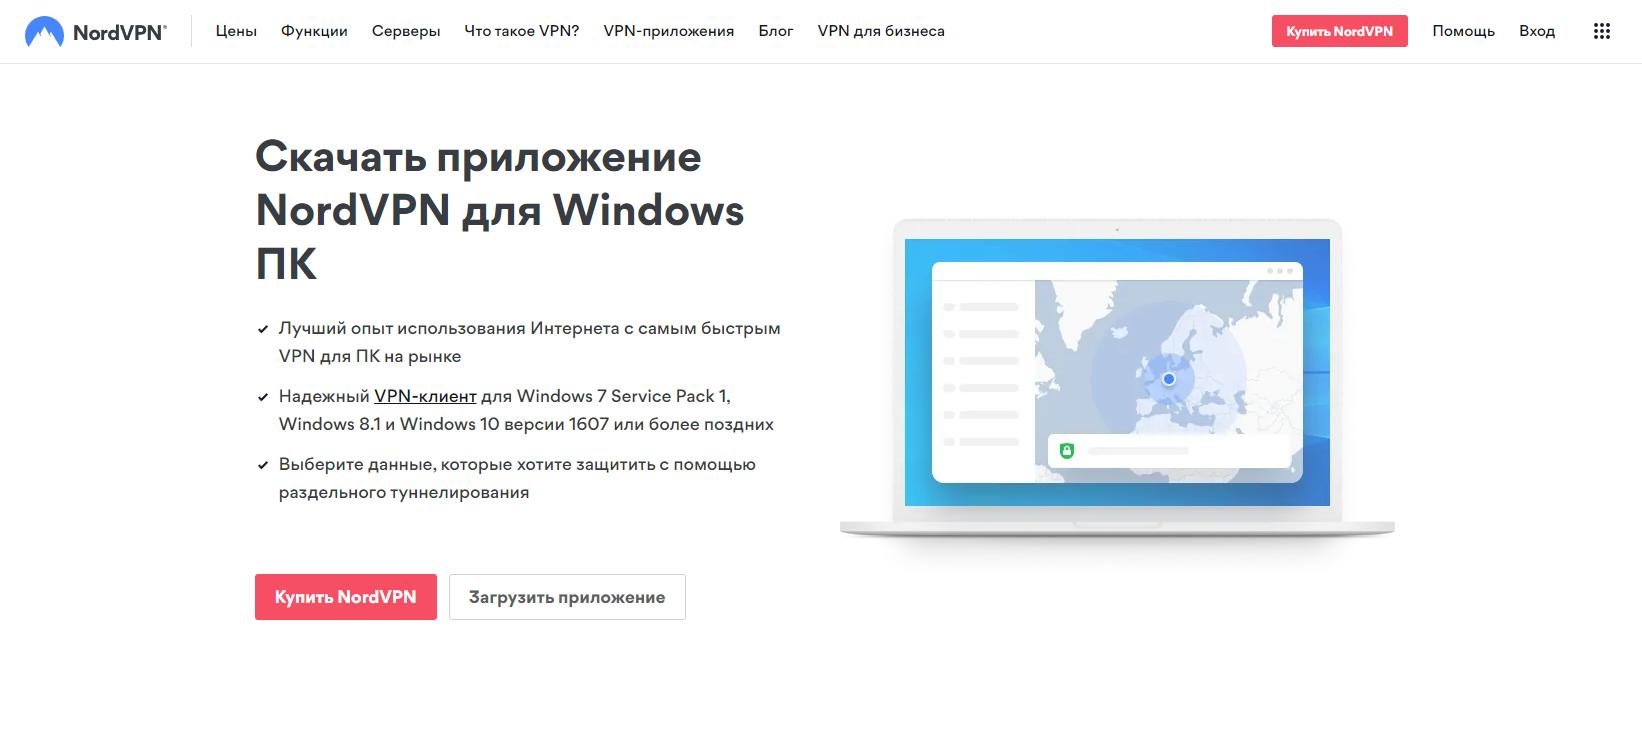 NordVPN-download on Windows